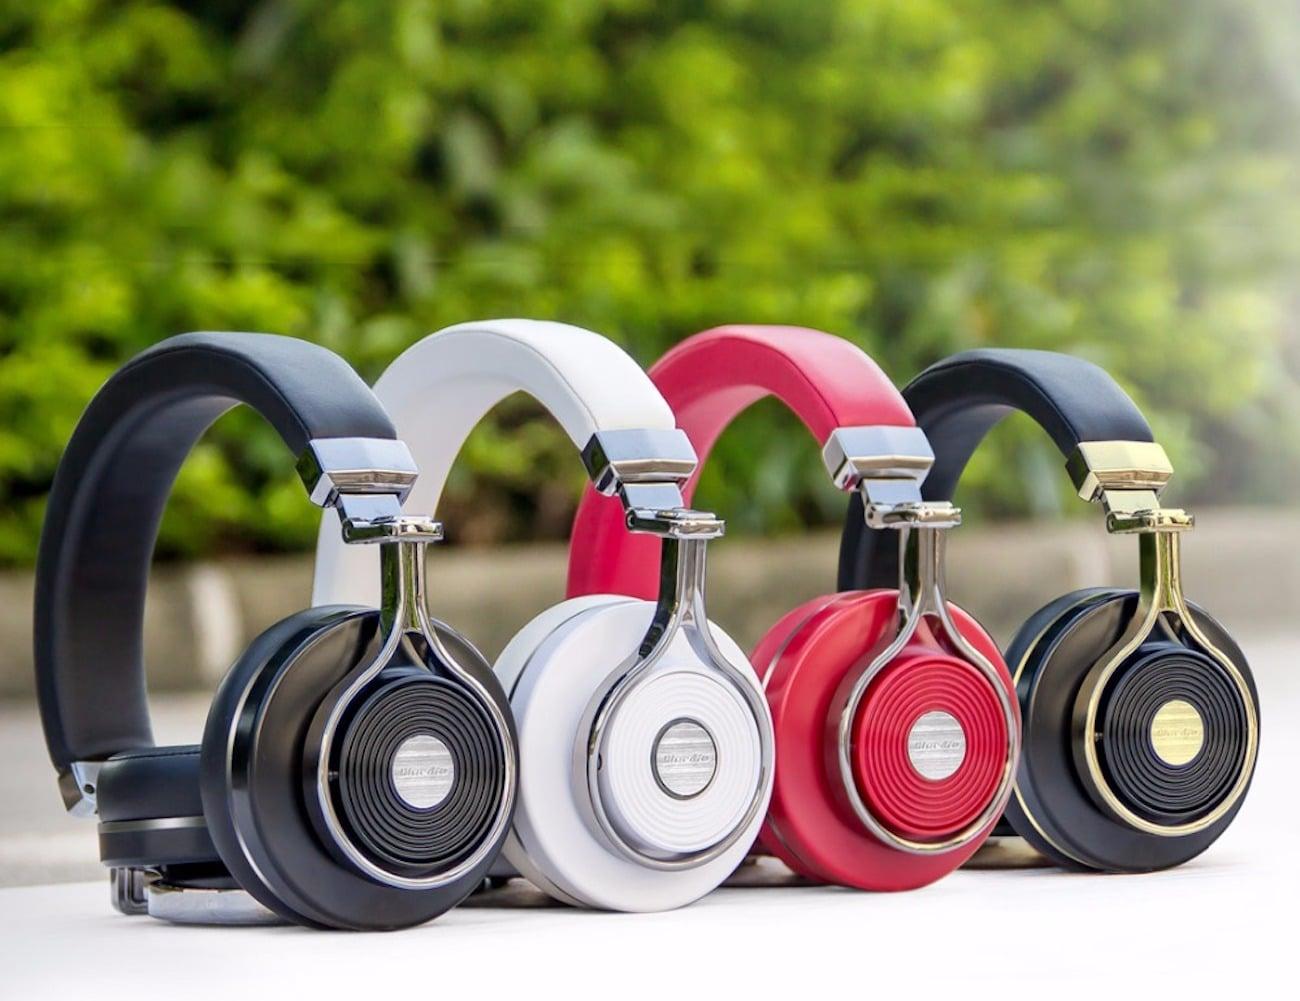 3D Stereo Wireless Headphone